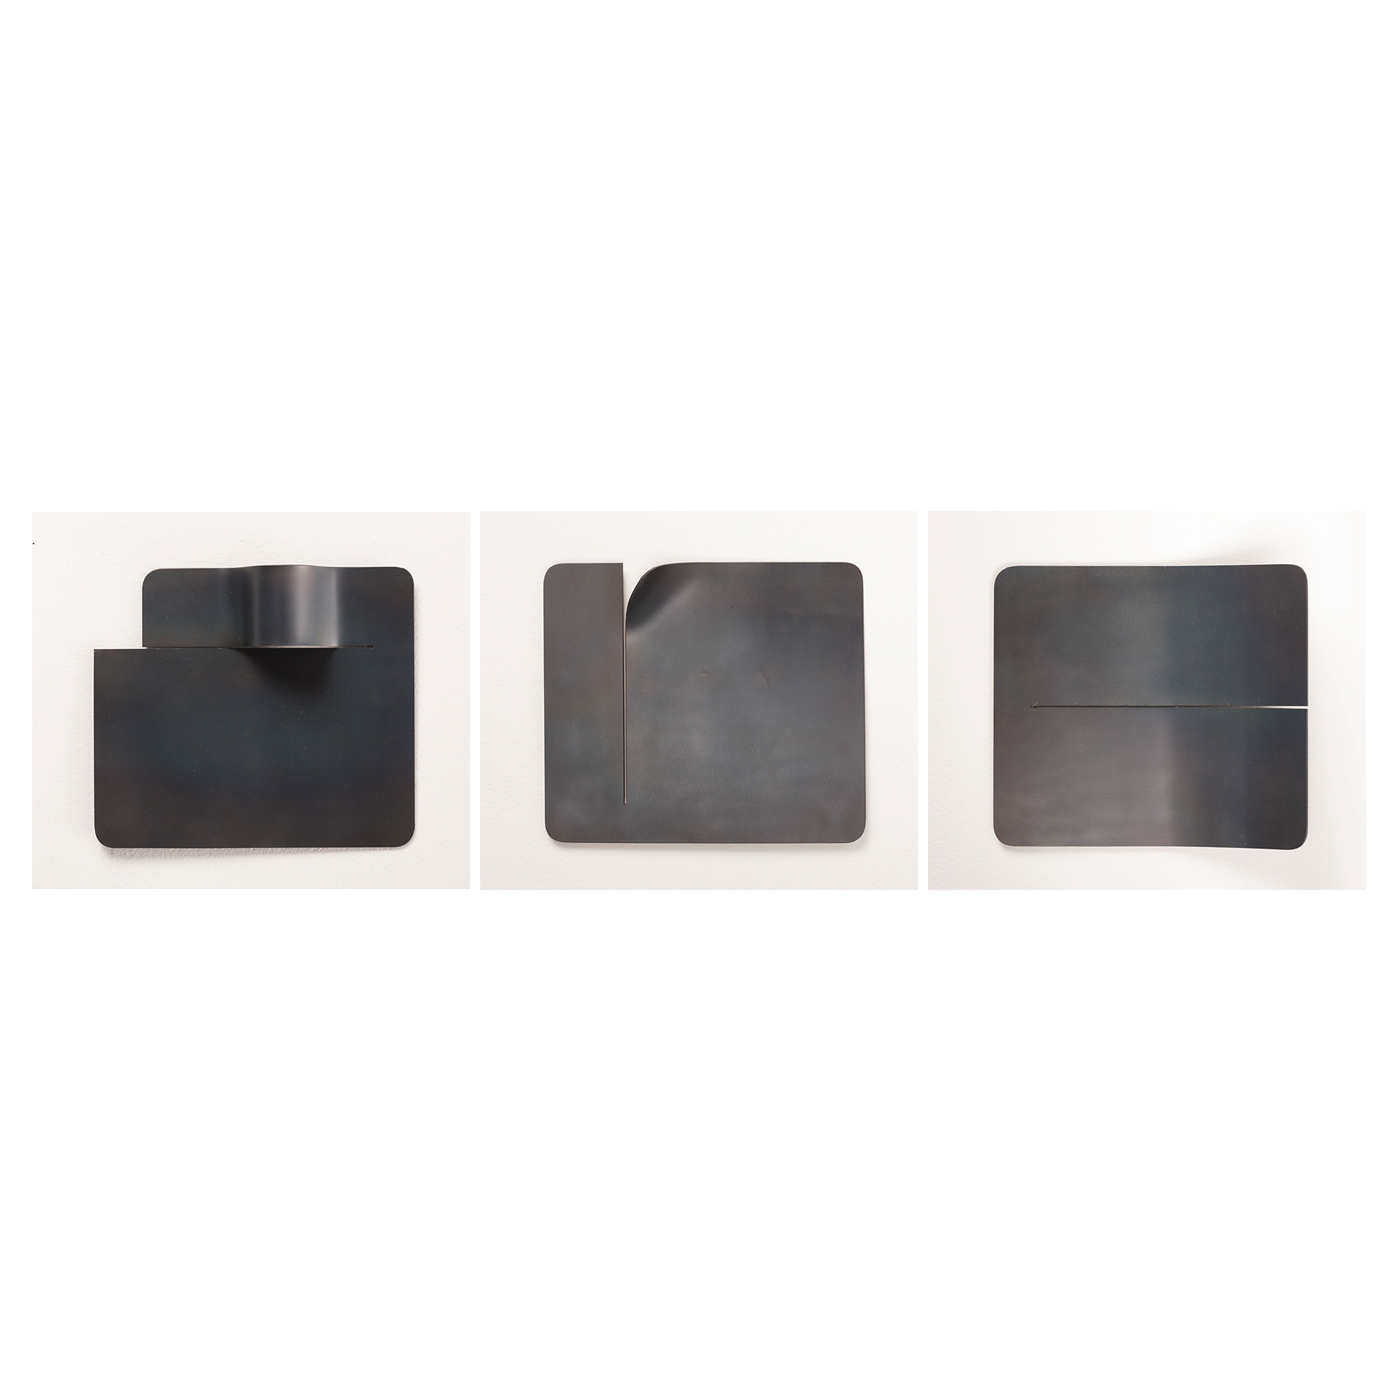 Alberte N. Tranberg - Foldings